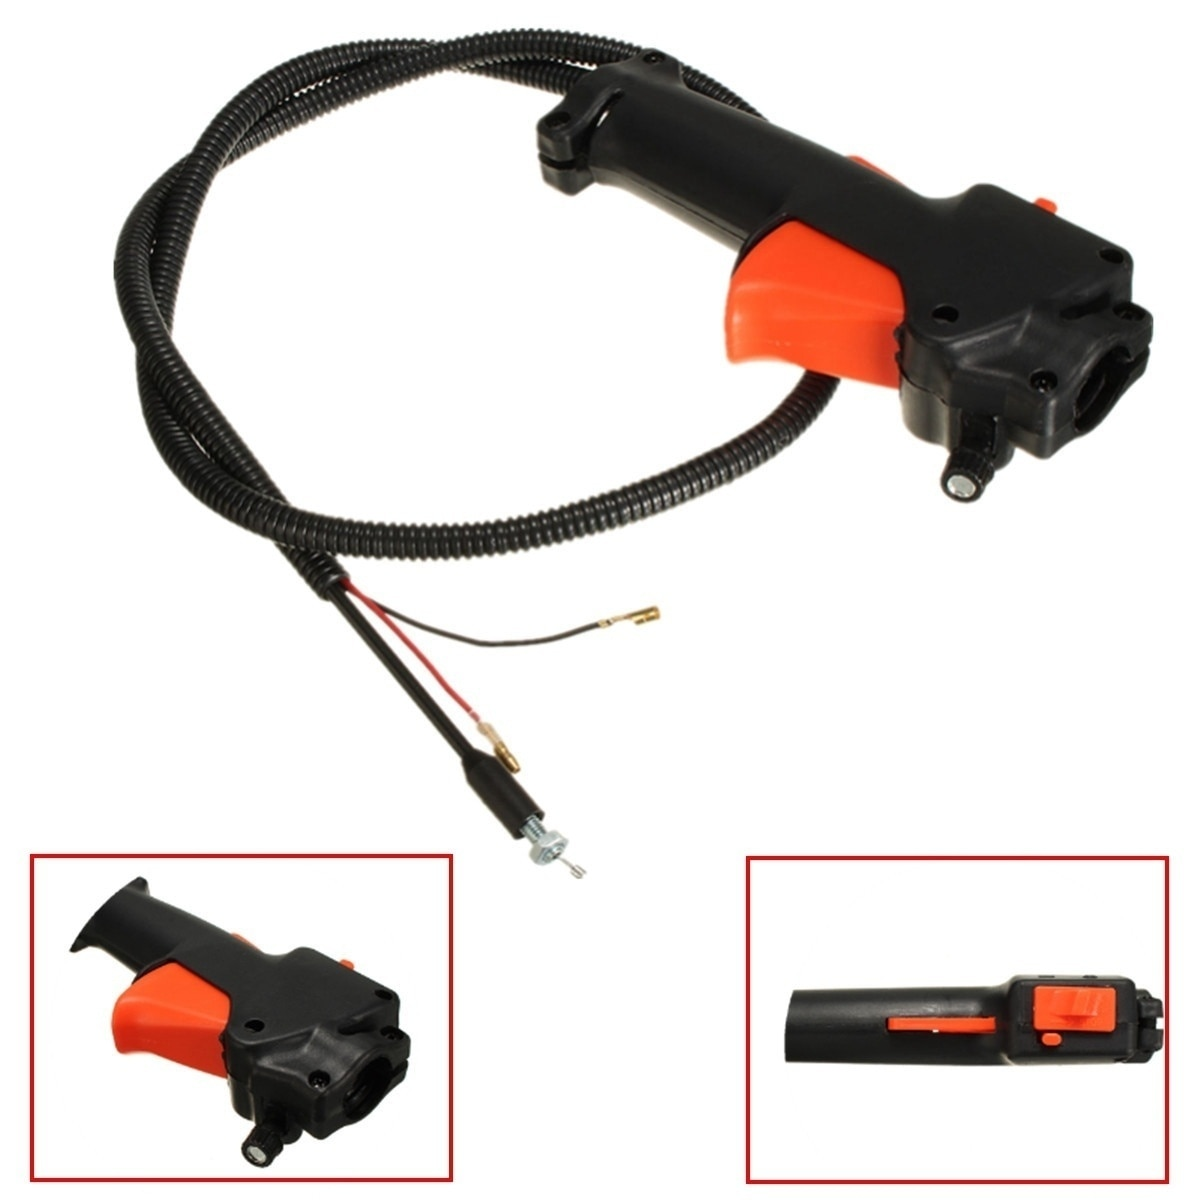 Interruptor de Asa Cable disparador de acelerador para cortadora de césped